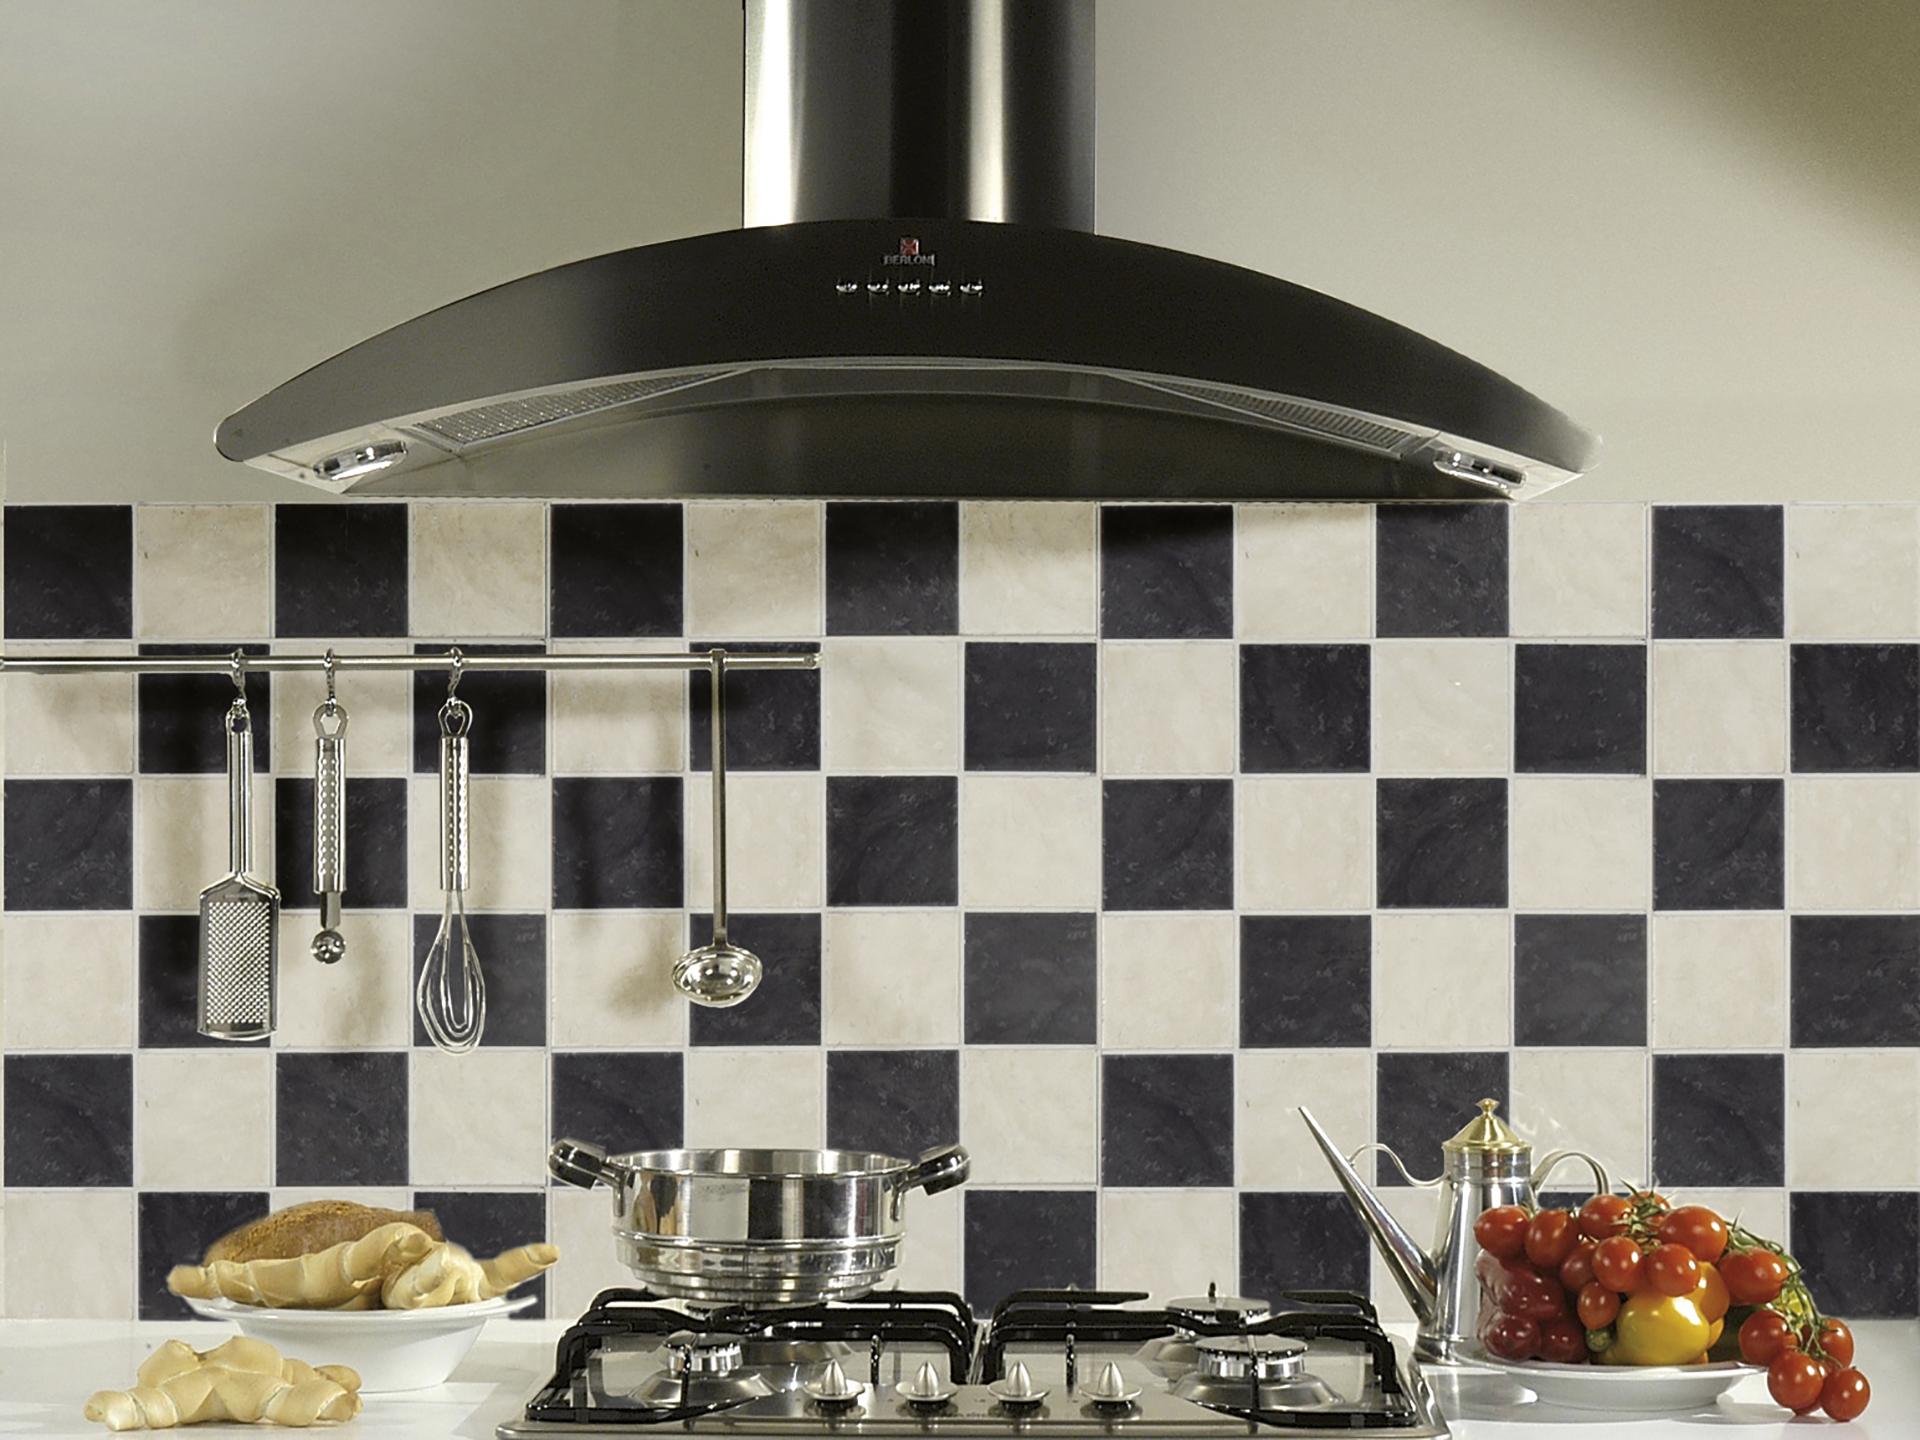 Keuken Tegels 10x10 : Wandtegel cosmopolitan 10x10 cm zwart hubo